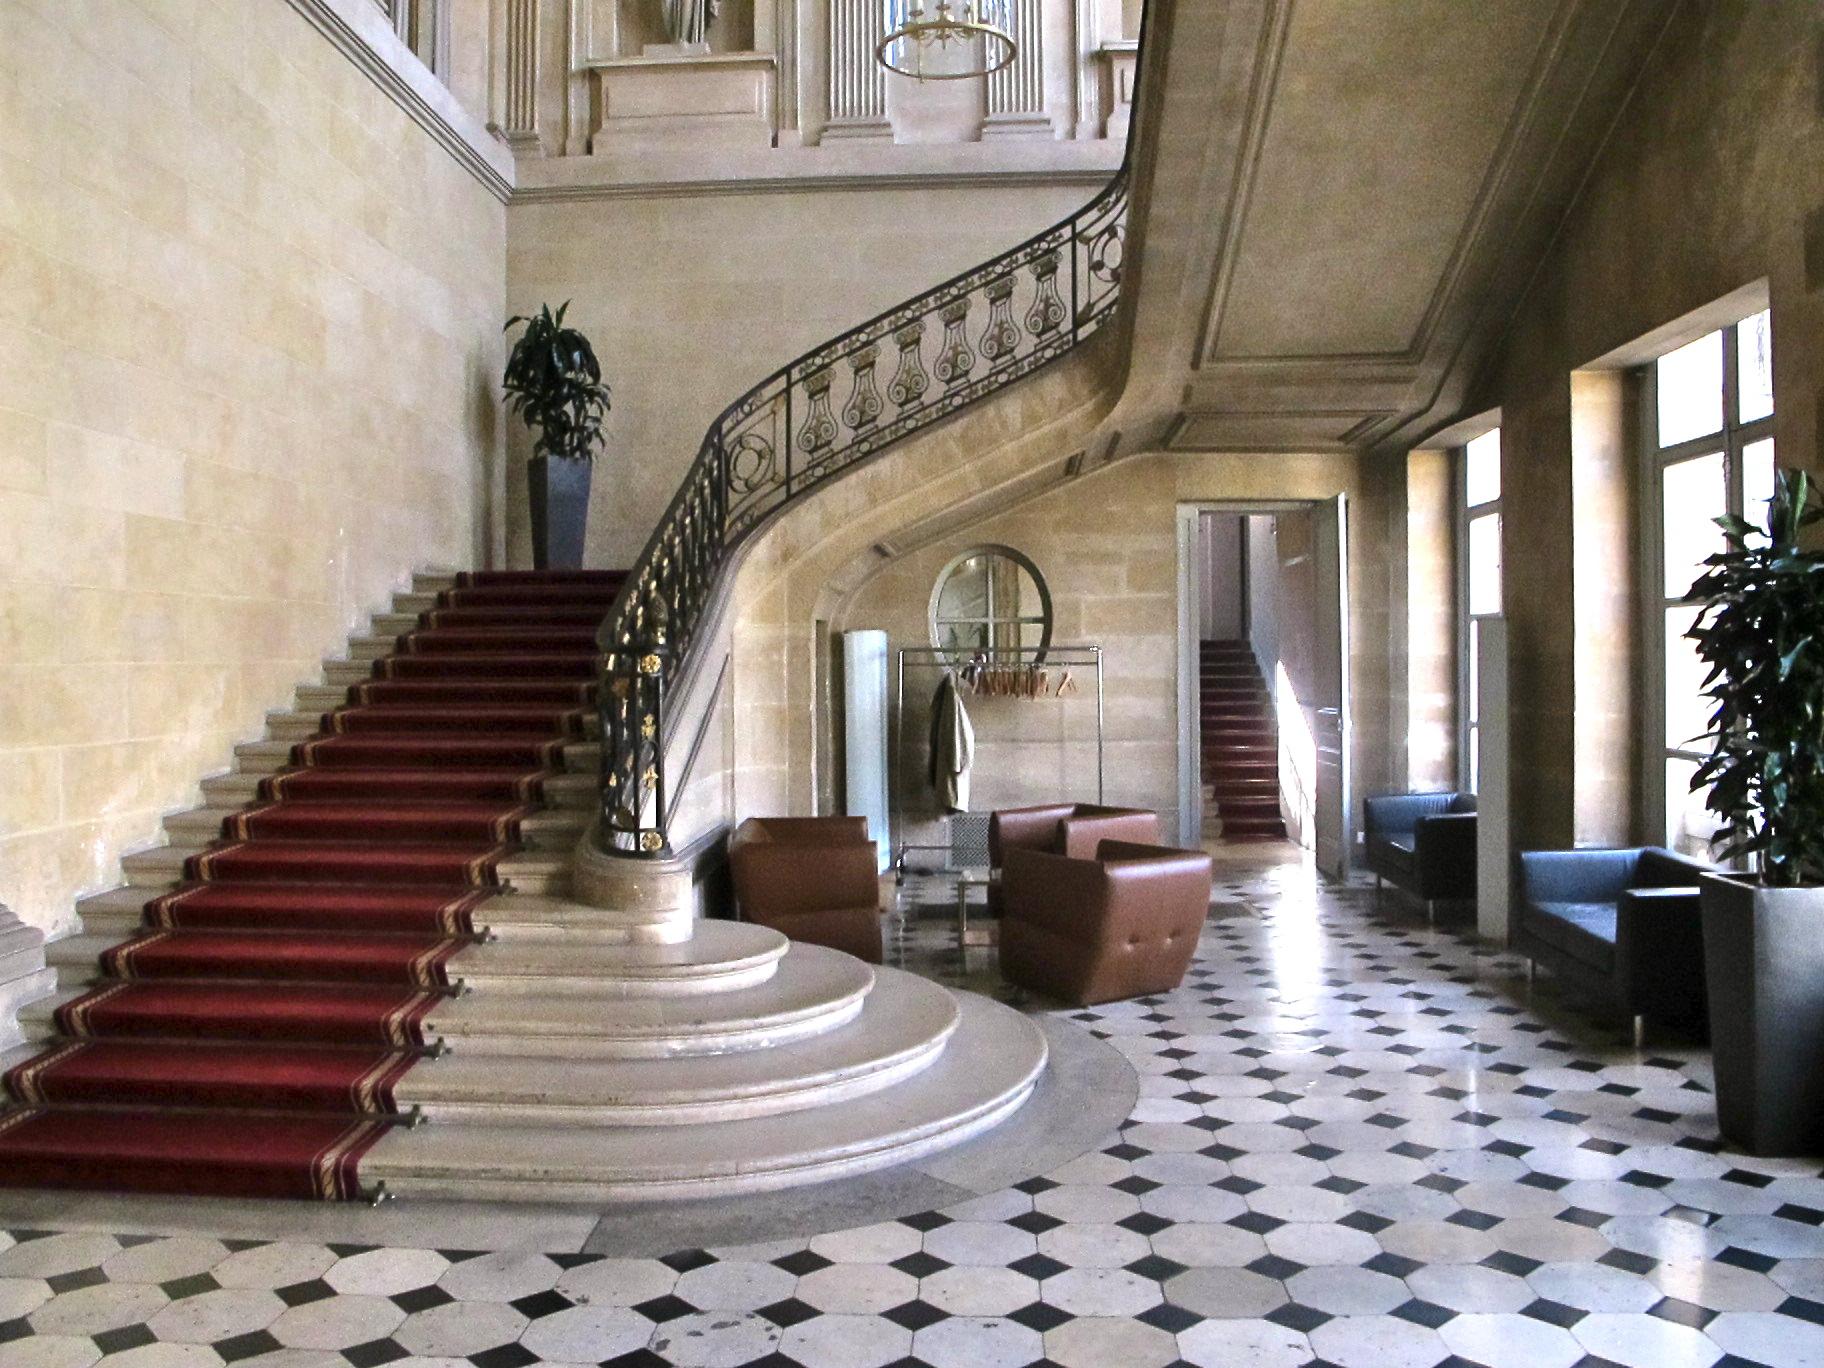 file escalier h tel ch telet paris jpg wikimedia commons. Black Bedroom Furniture Sets. Home Design Ideas